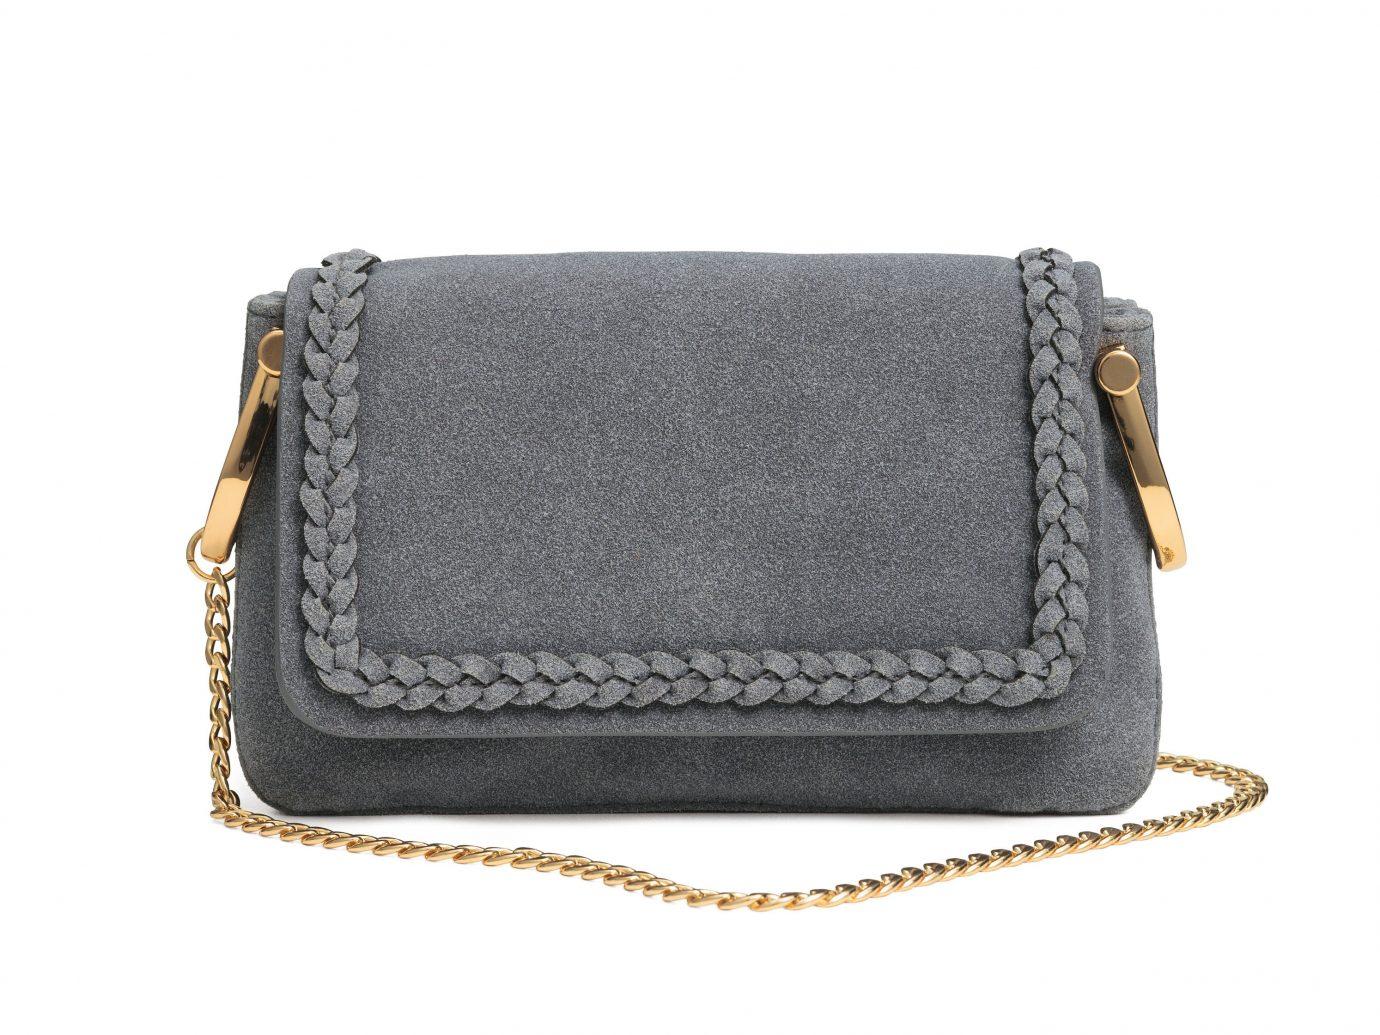 Style + Design bag handbag indoor shoulder bag fashion accessory leather coin purse accessory case